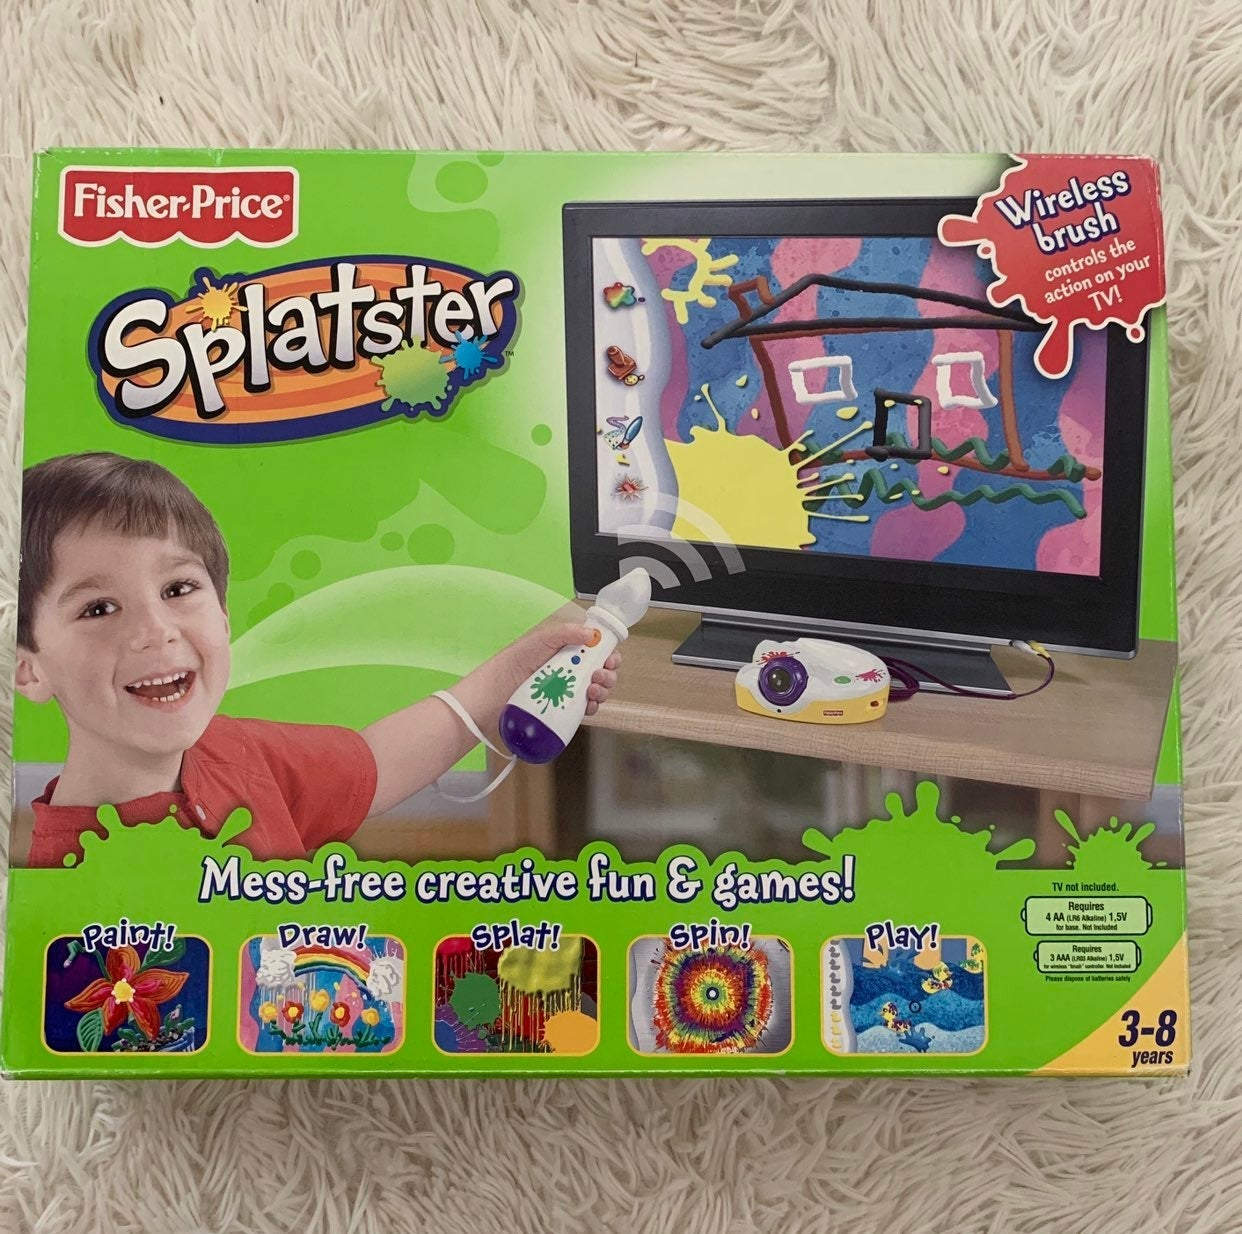 Fisher-Price splatster